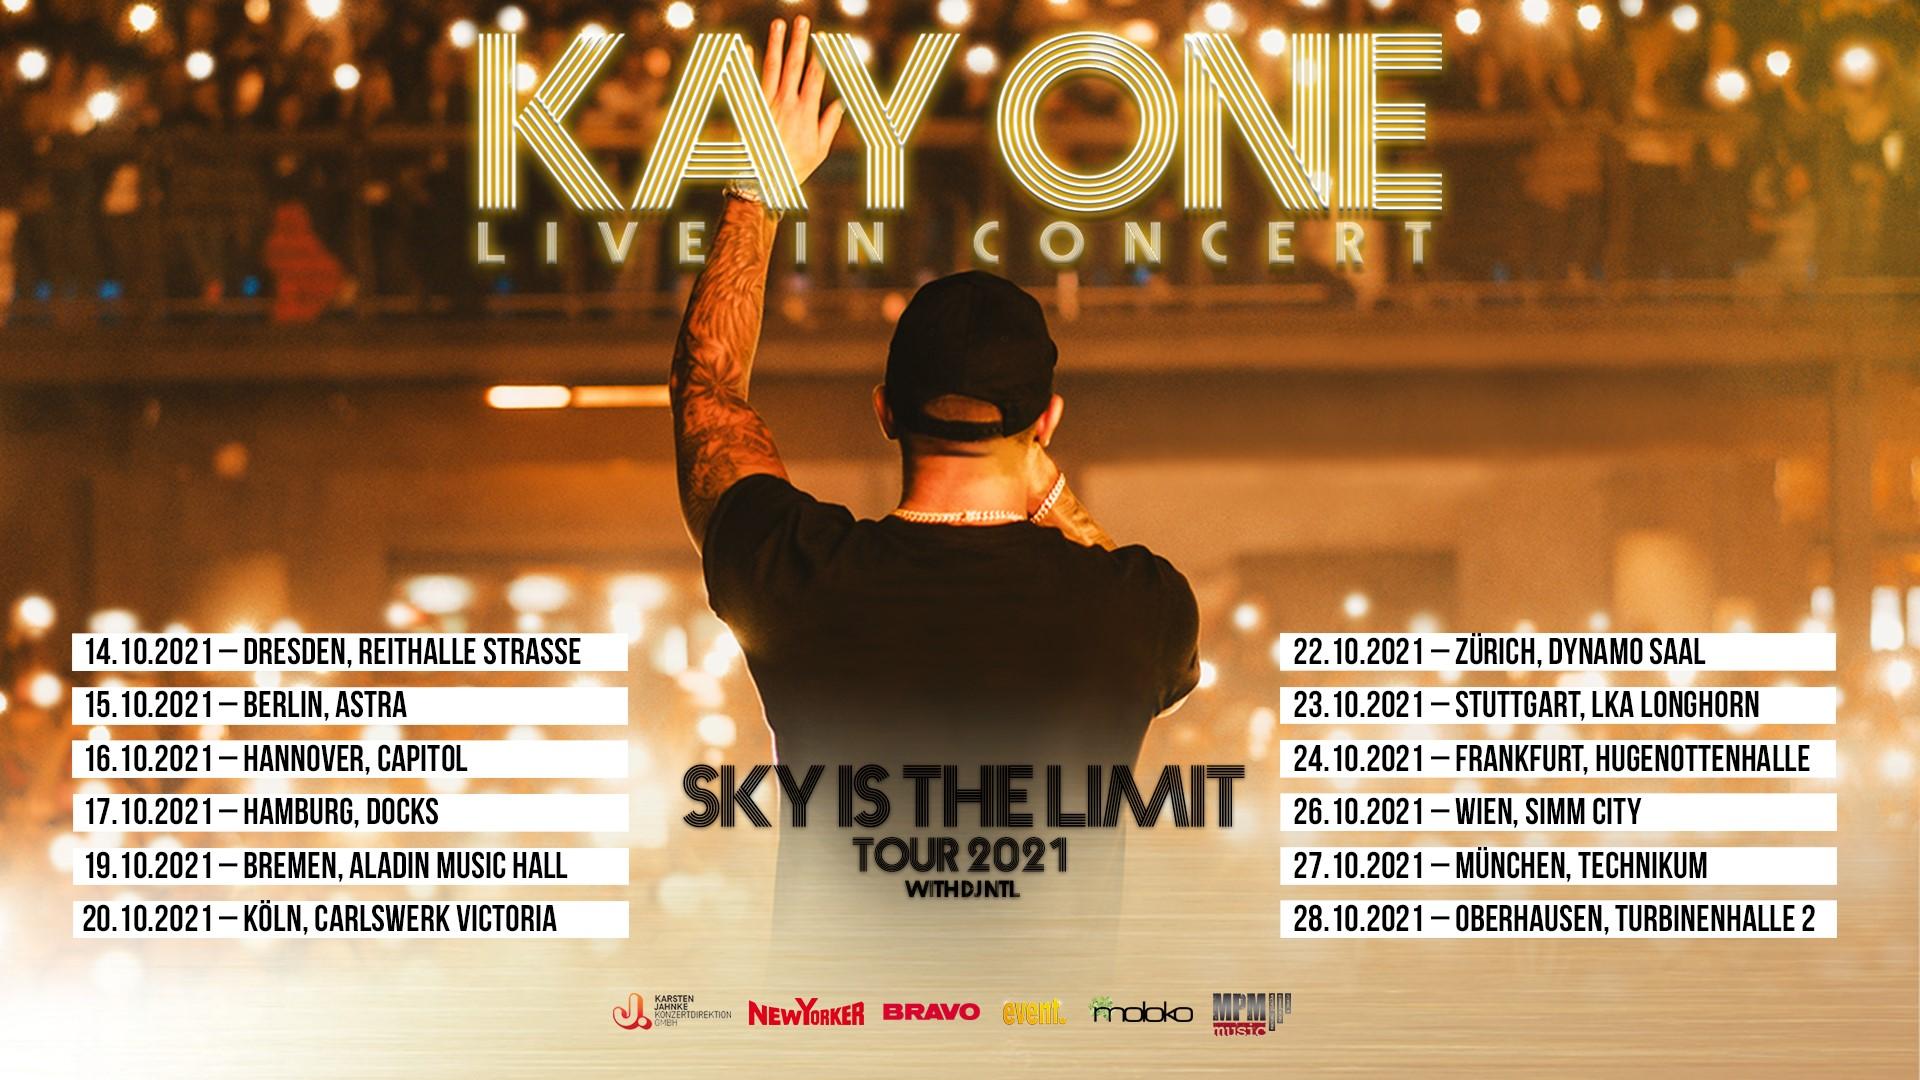 Events Wien: Kay One // Sky Is The Limit Tour 2021 // Wien